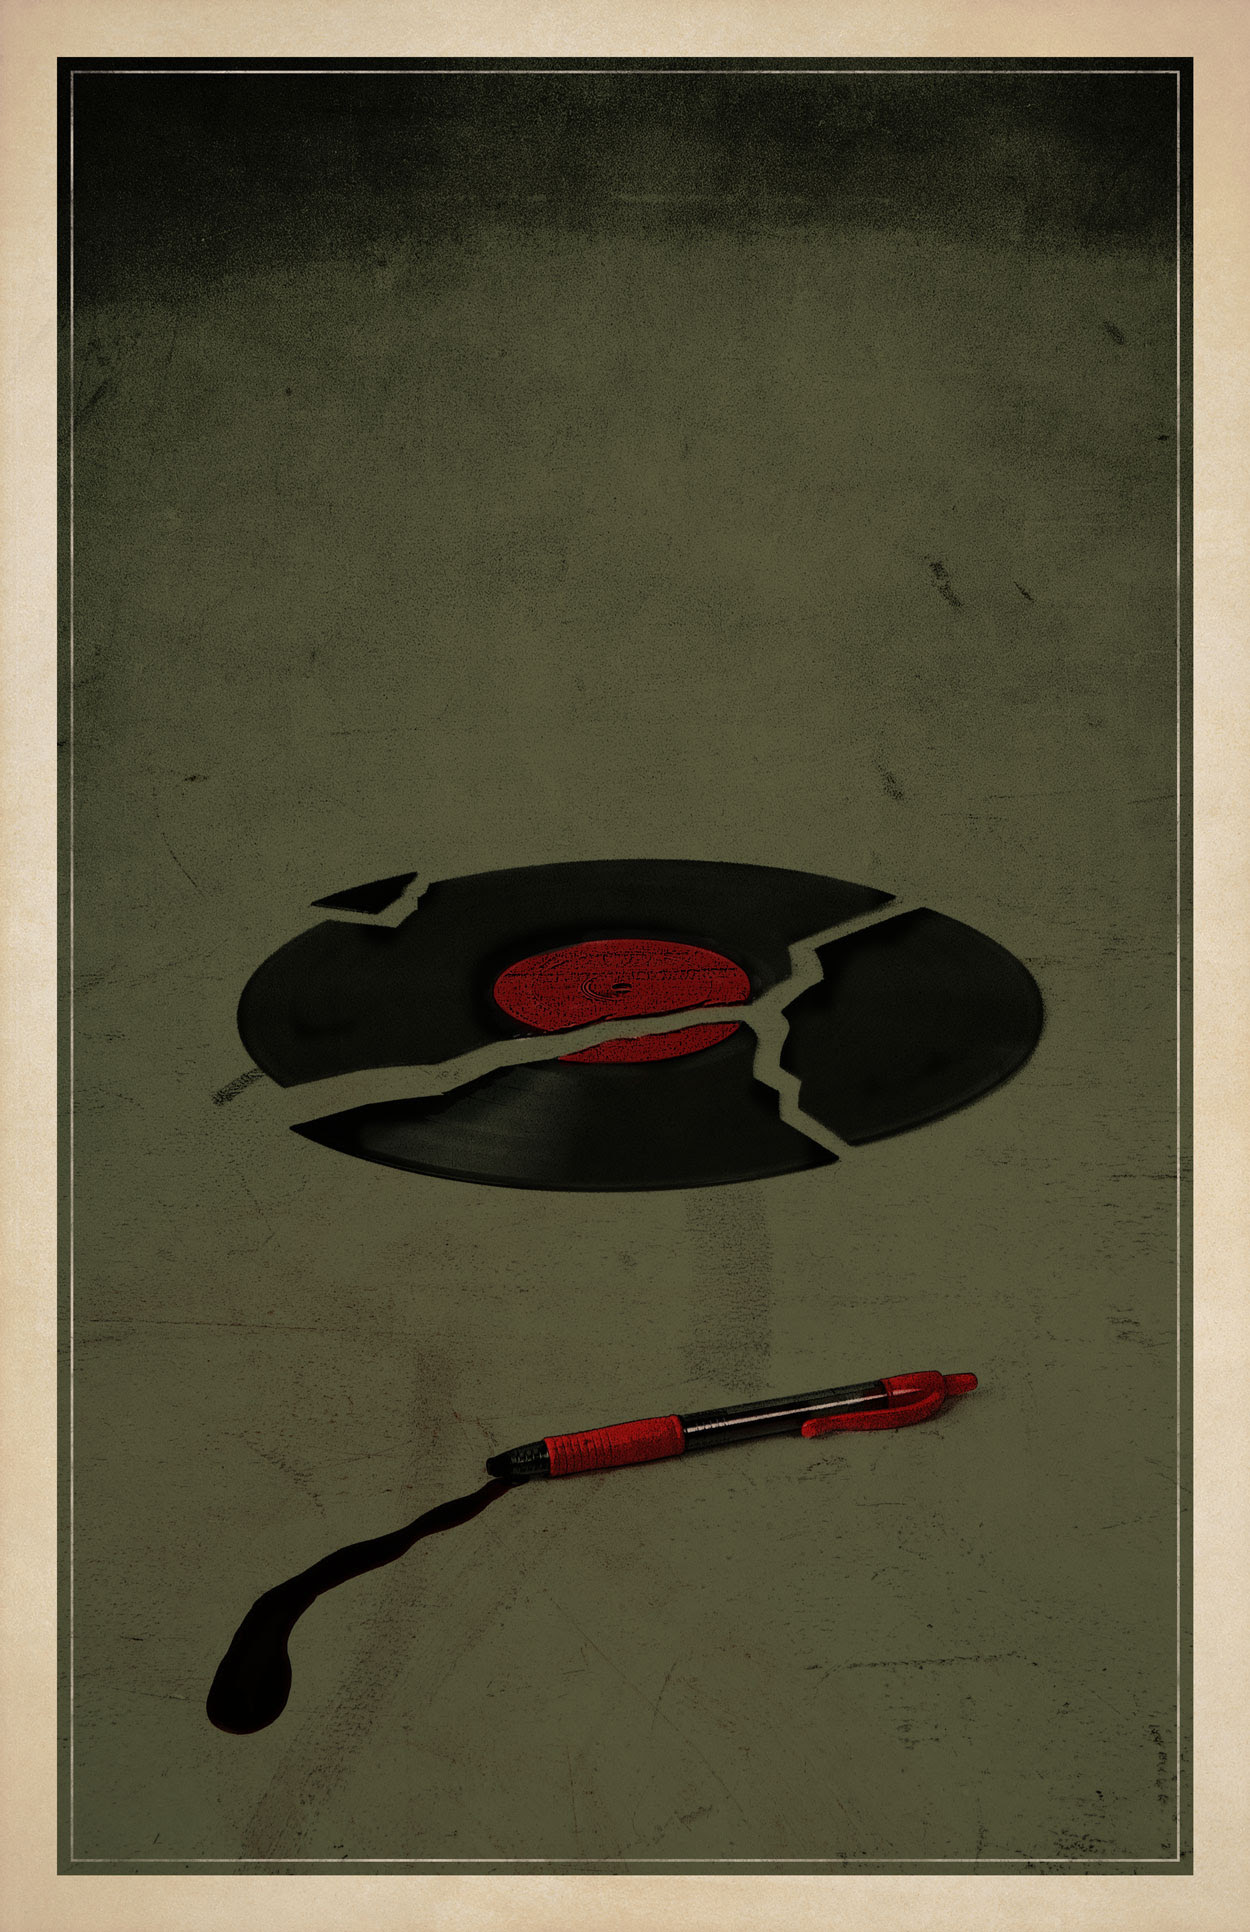 Shaun of the Dead Minimalist Poster